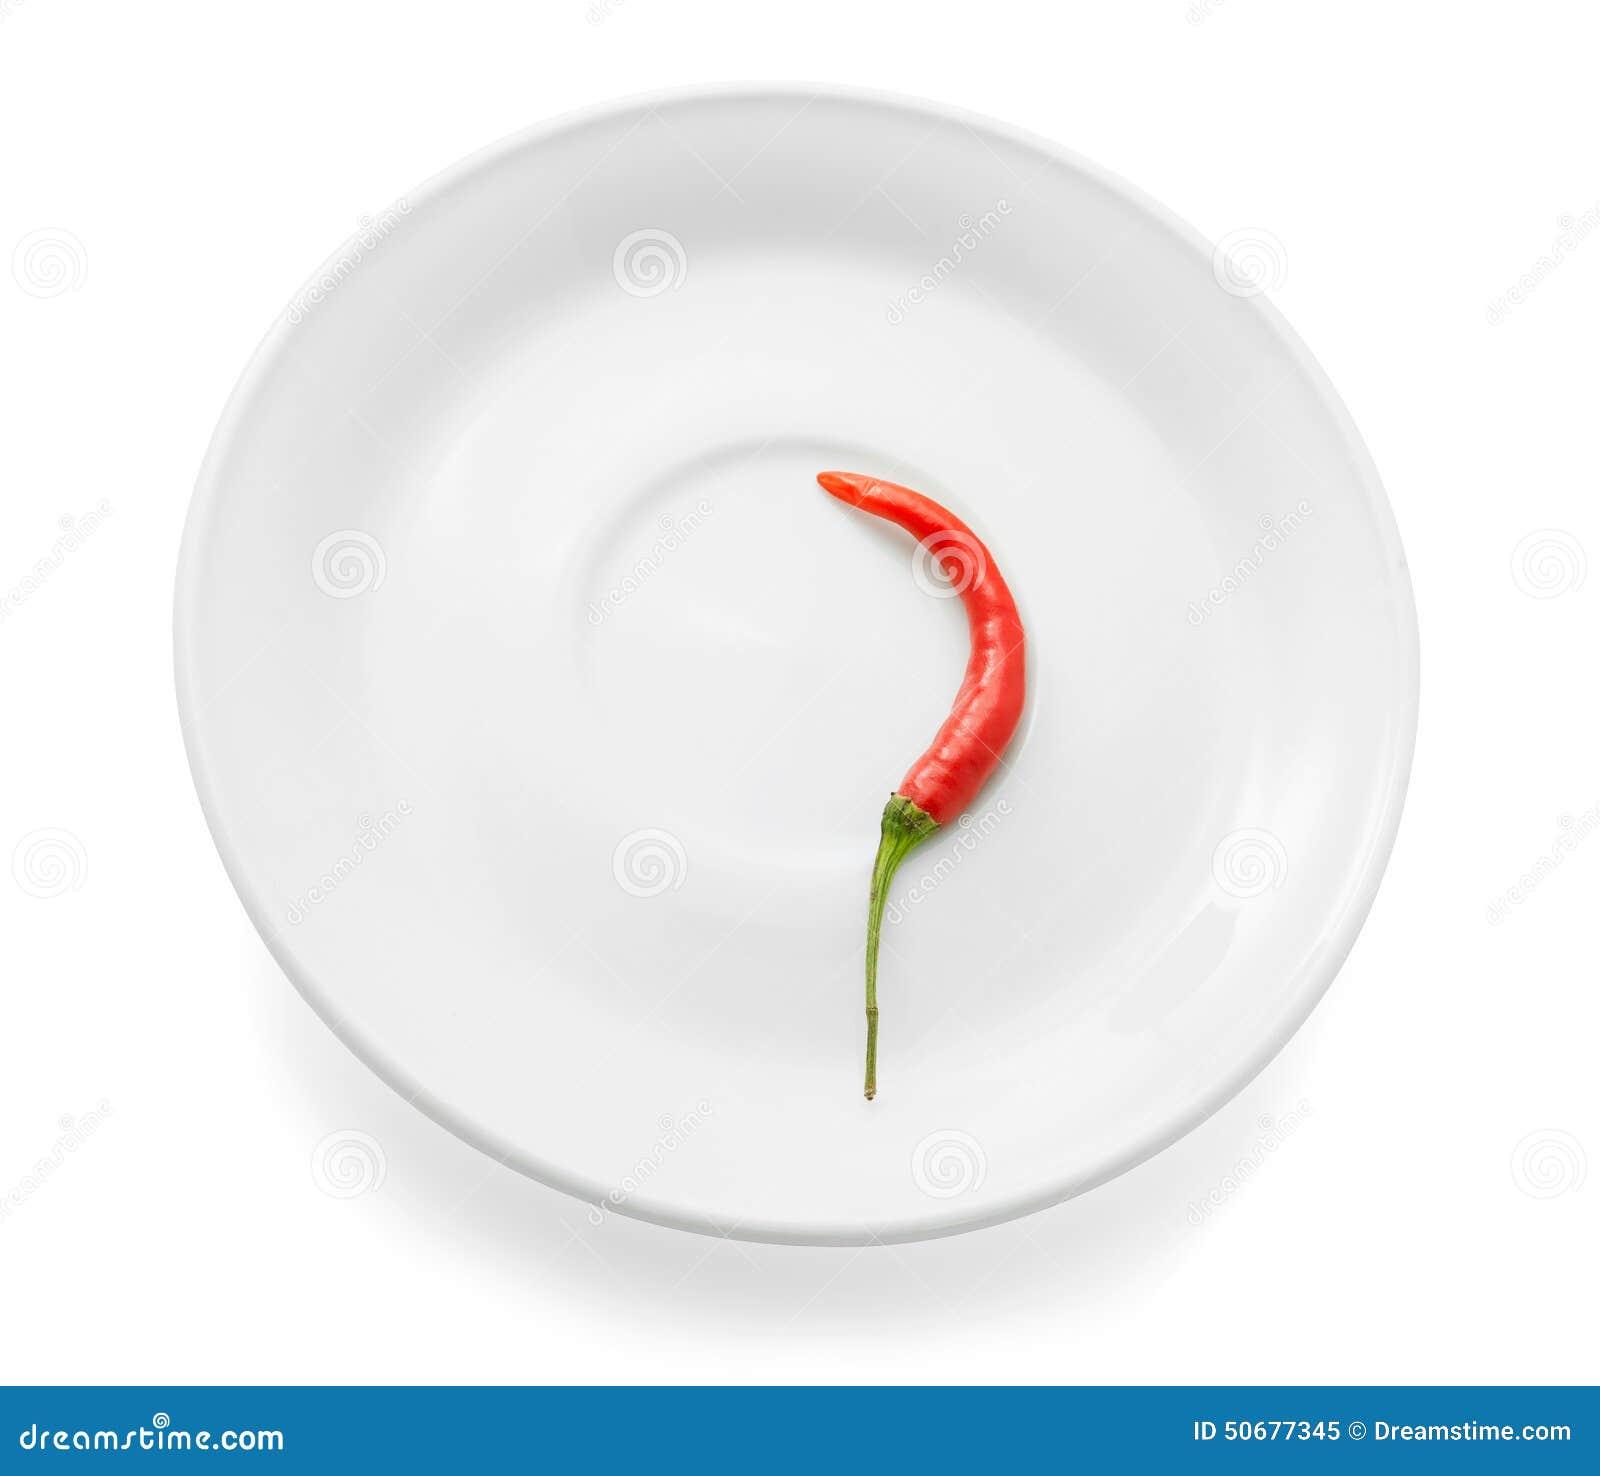 Download 在一块白色板材的红辣椒 库存图片. 图片 包括有 成熟, 胡椒, 空白, 本质, 生气勃勃, 素食主义者 - 50677345